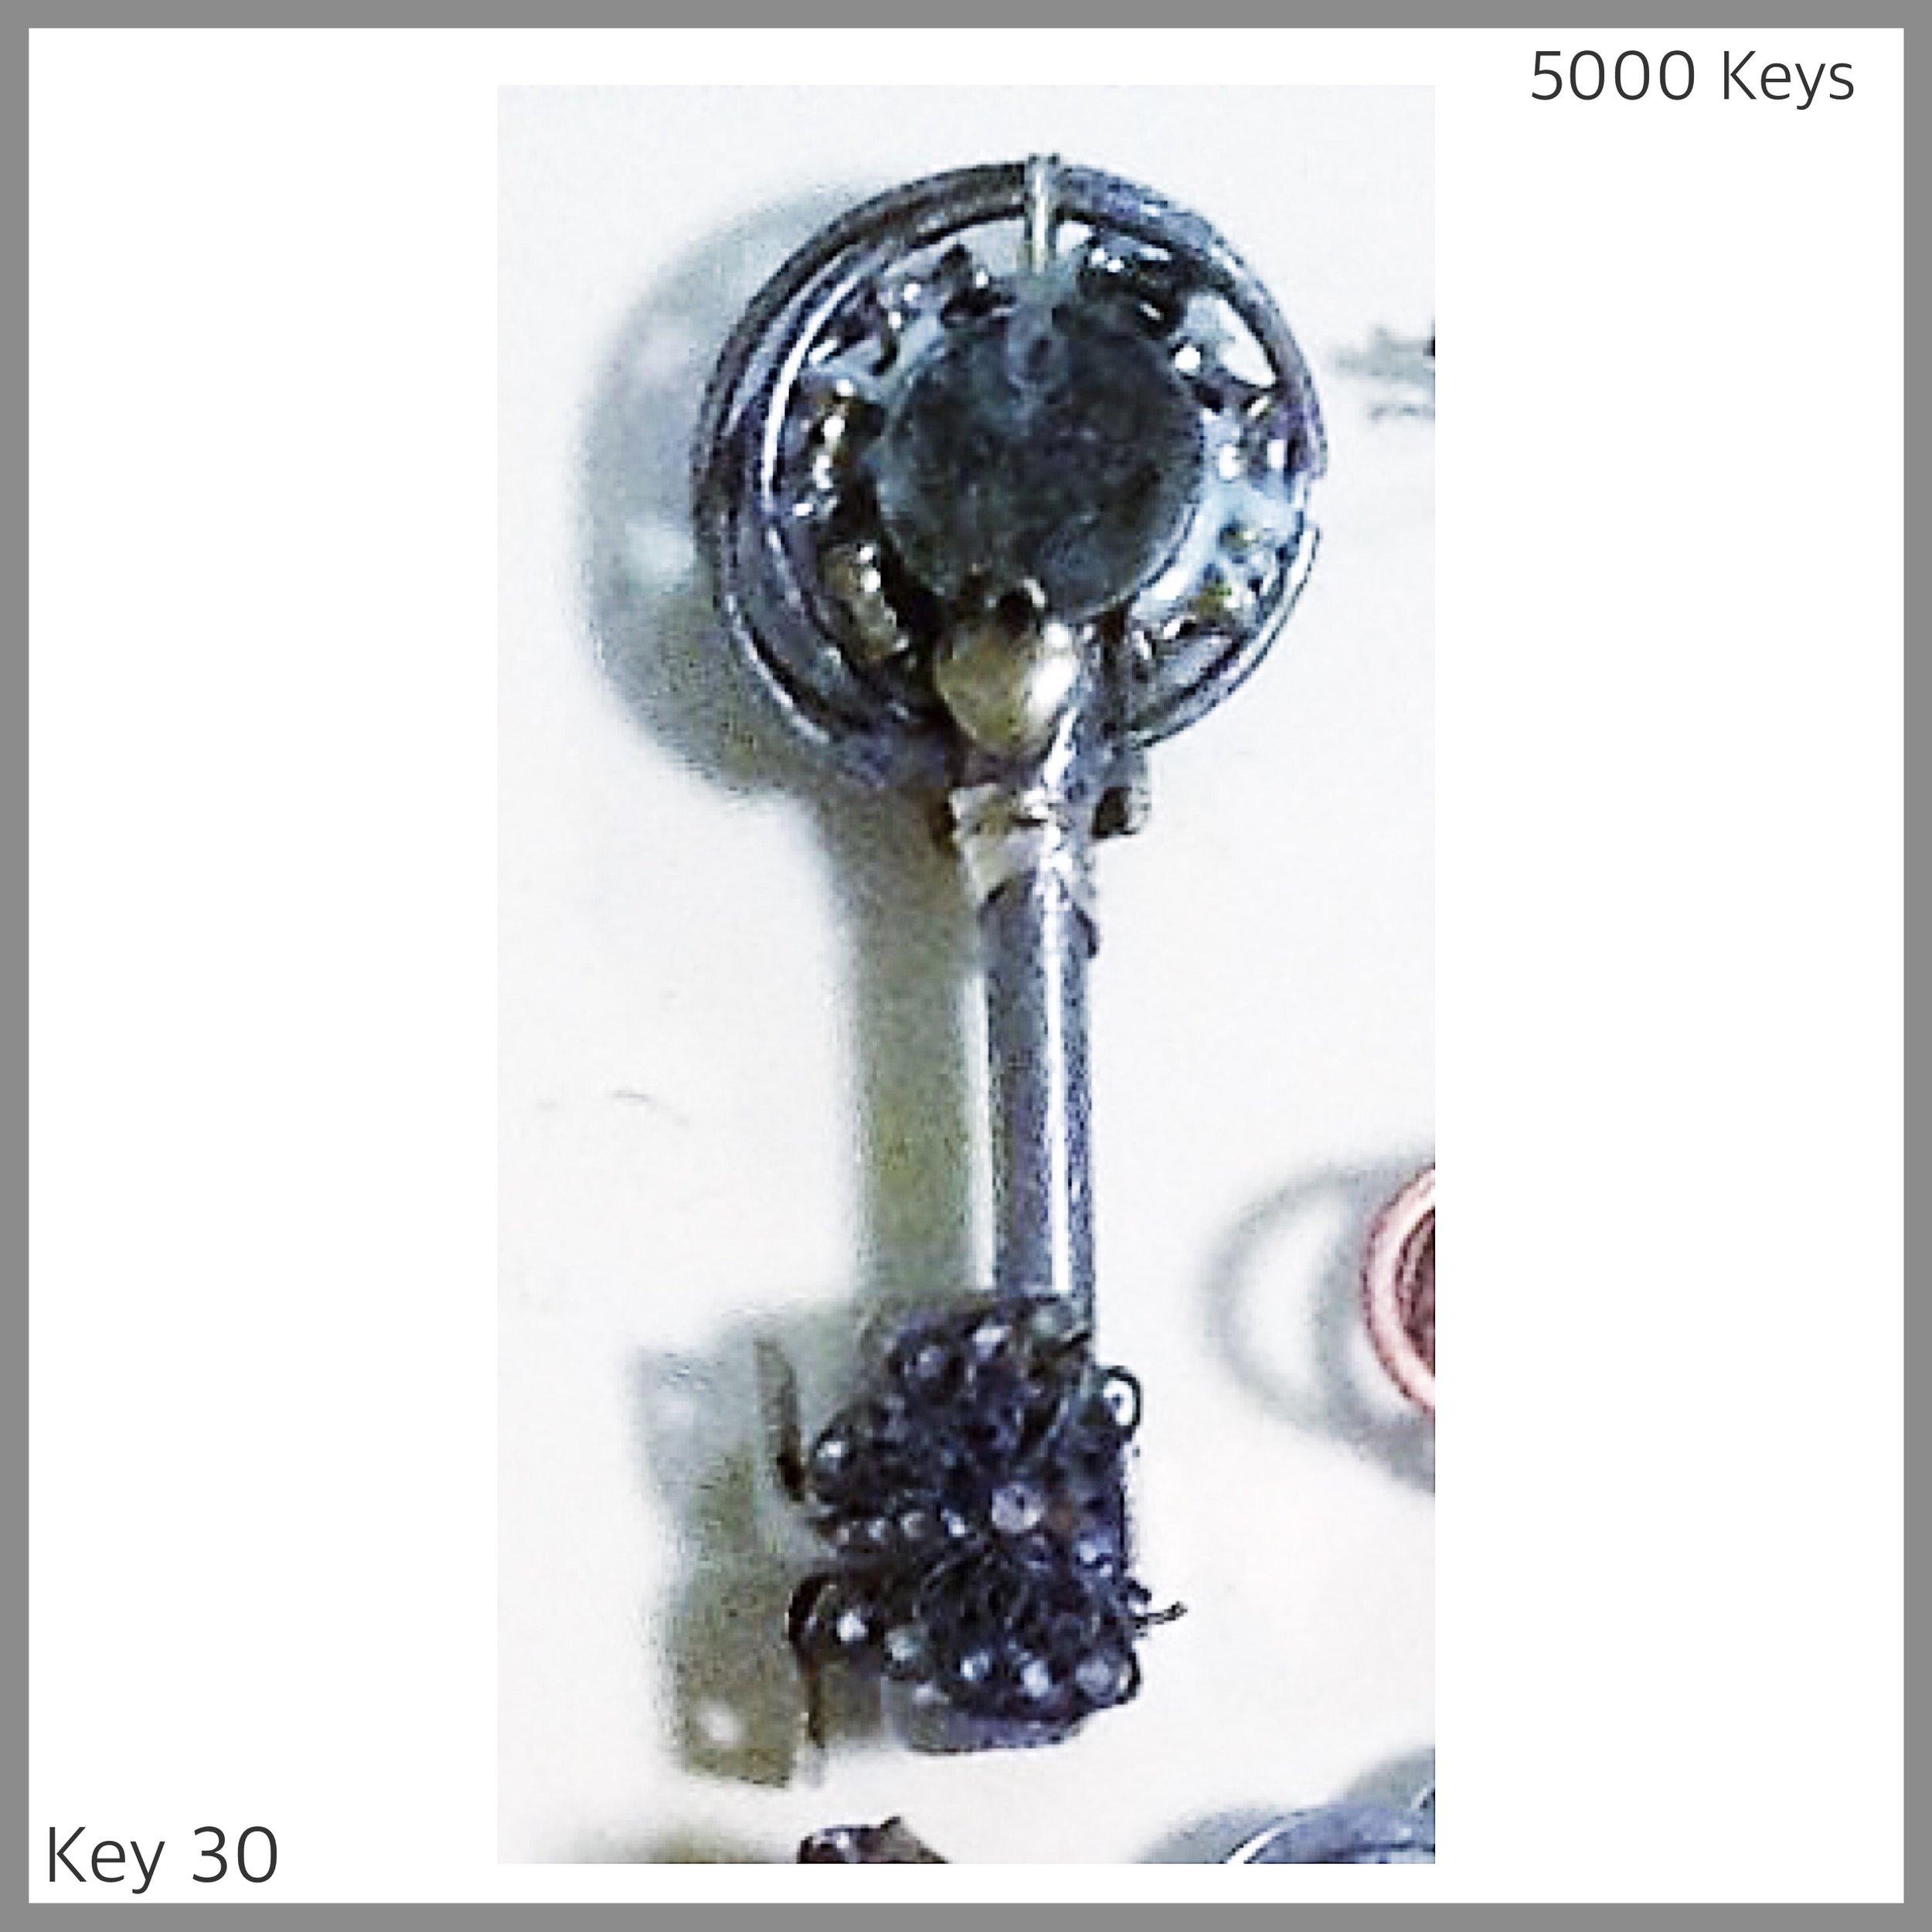 Key 30.jpg